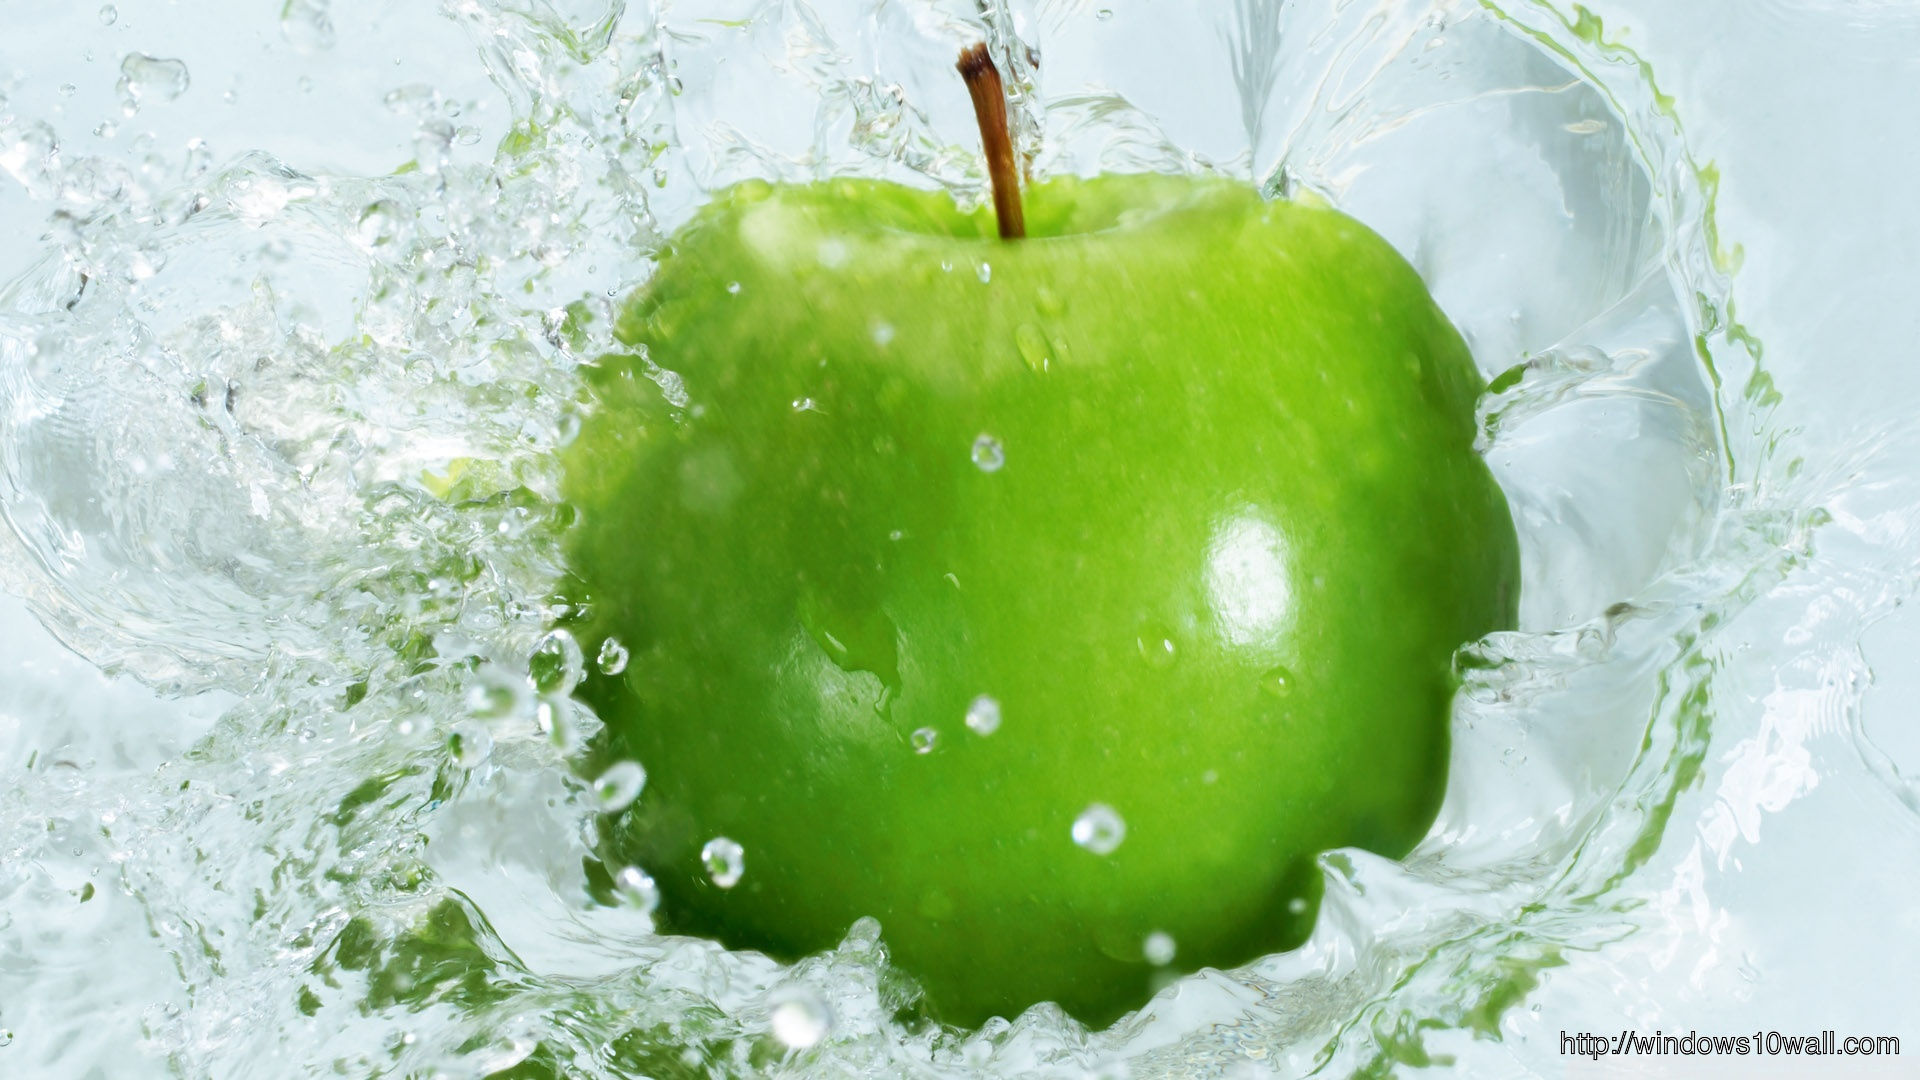 Green Apple Splash Wallpaper ⋆ Windows 10 Wallpapers